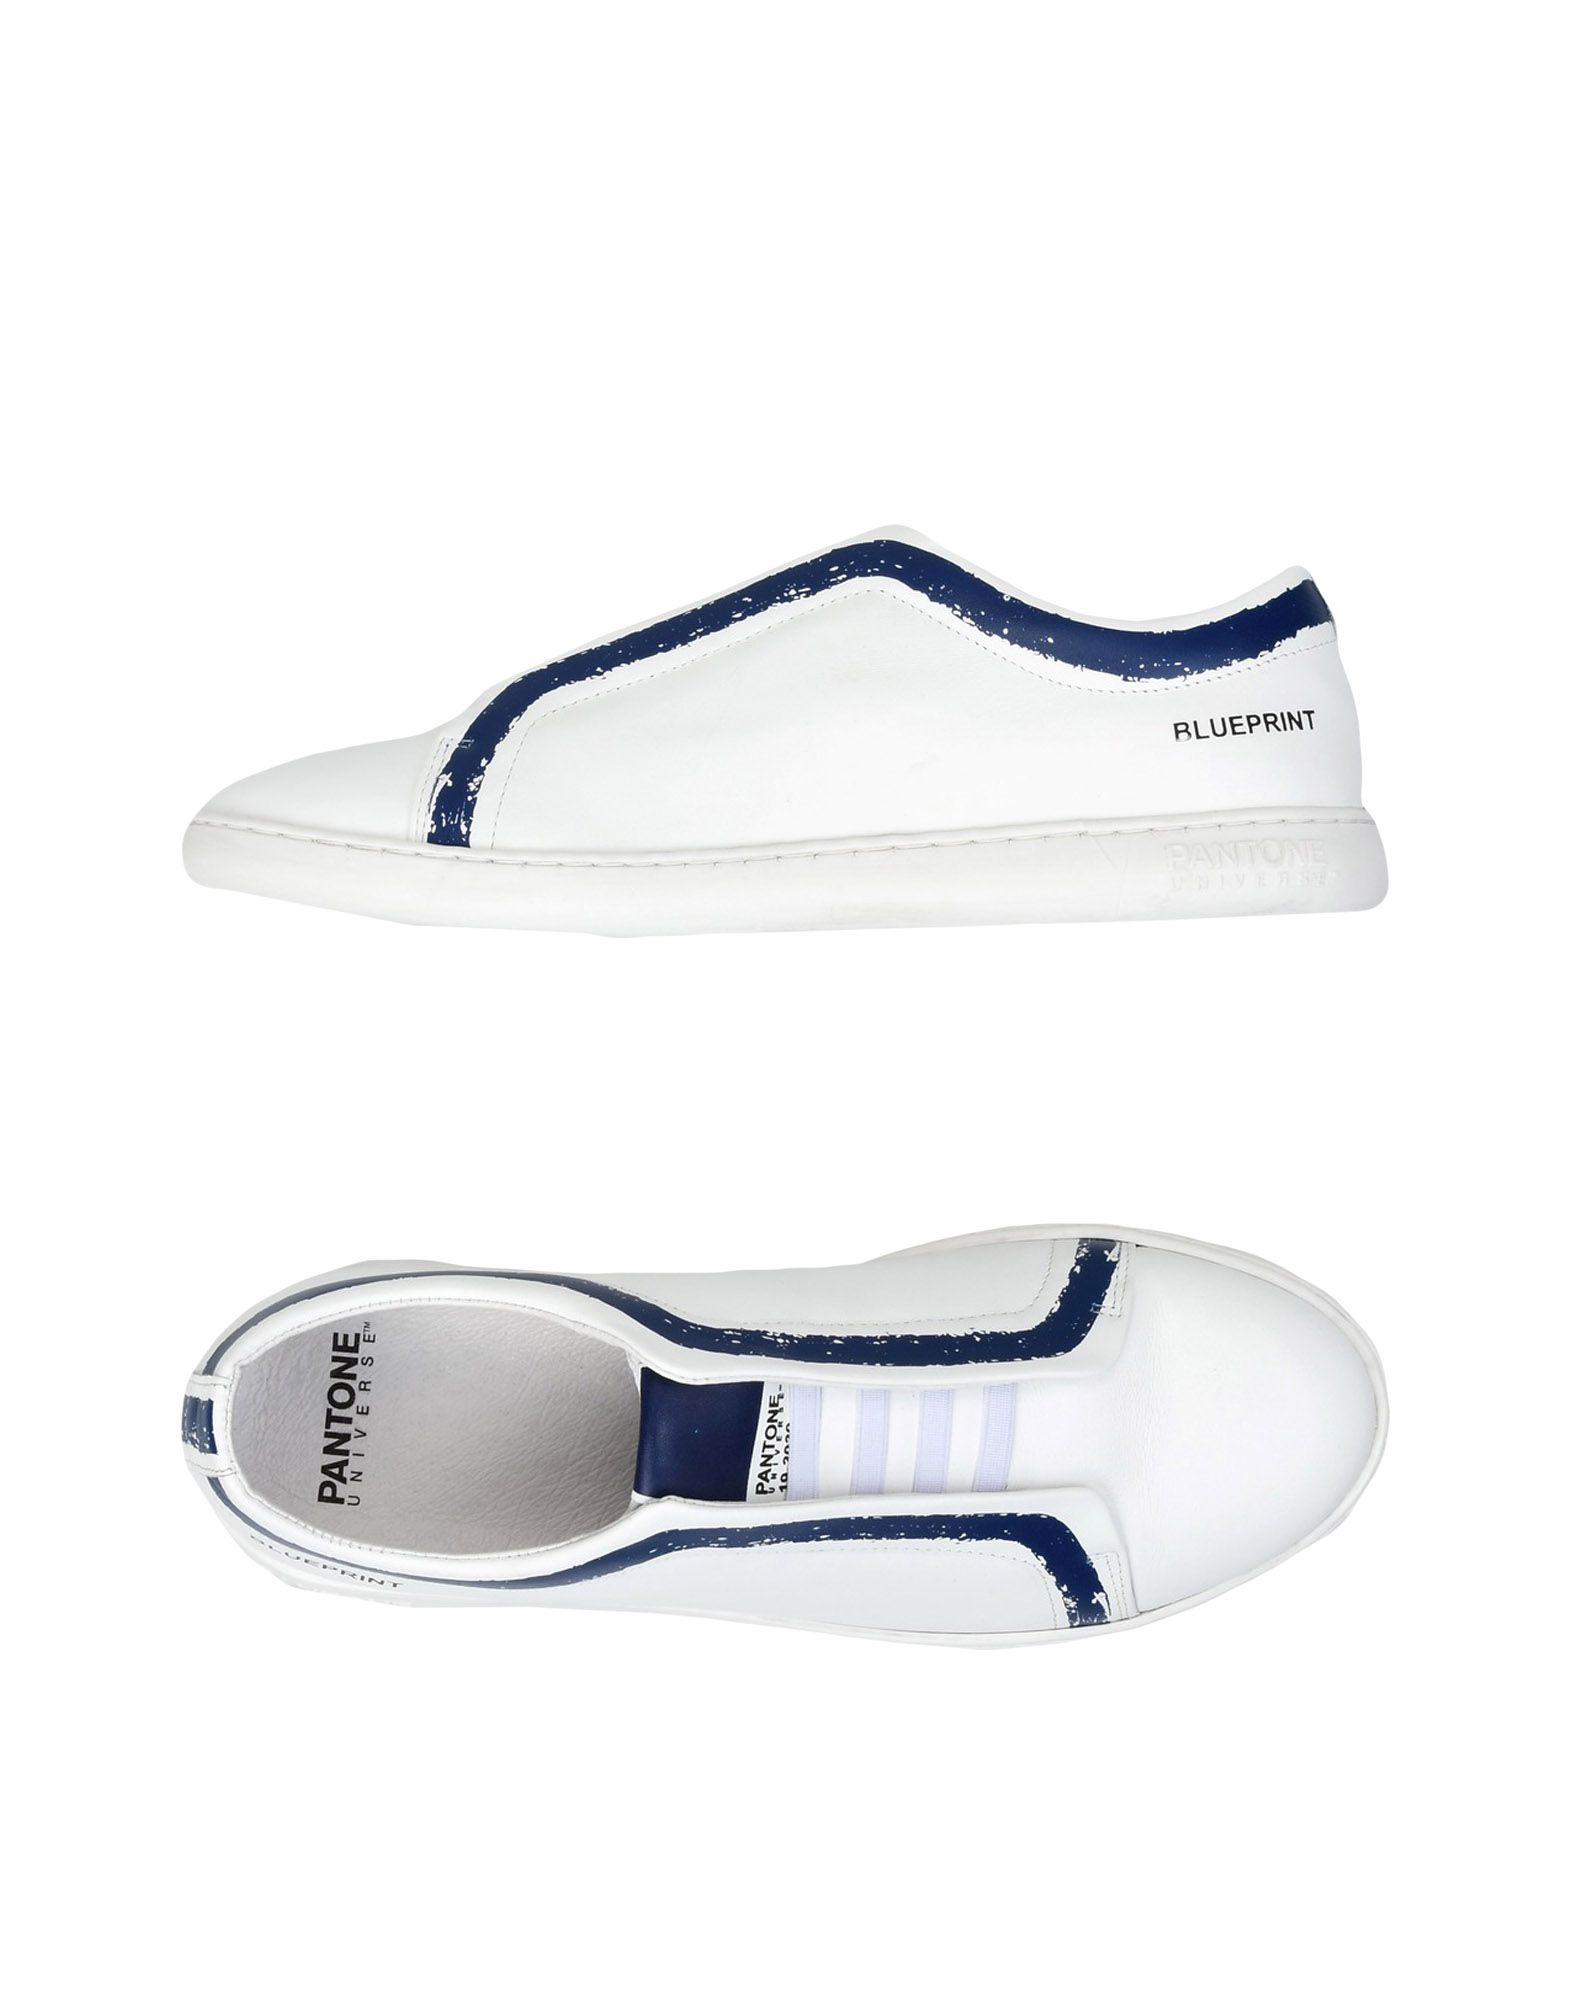 Pantone Universe Usa Open Leather - Sneakers - - - Men Pantone Universe Sneakers online on  Australia - 11224212CW bb1248